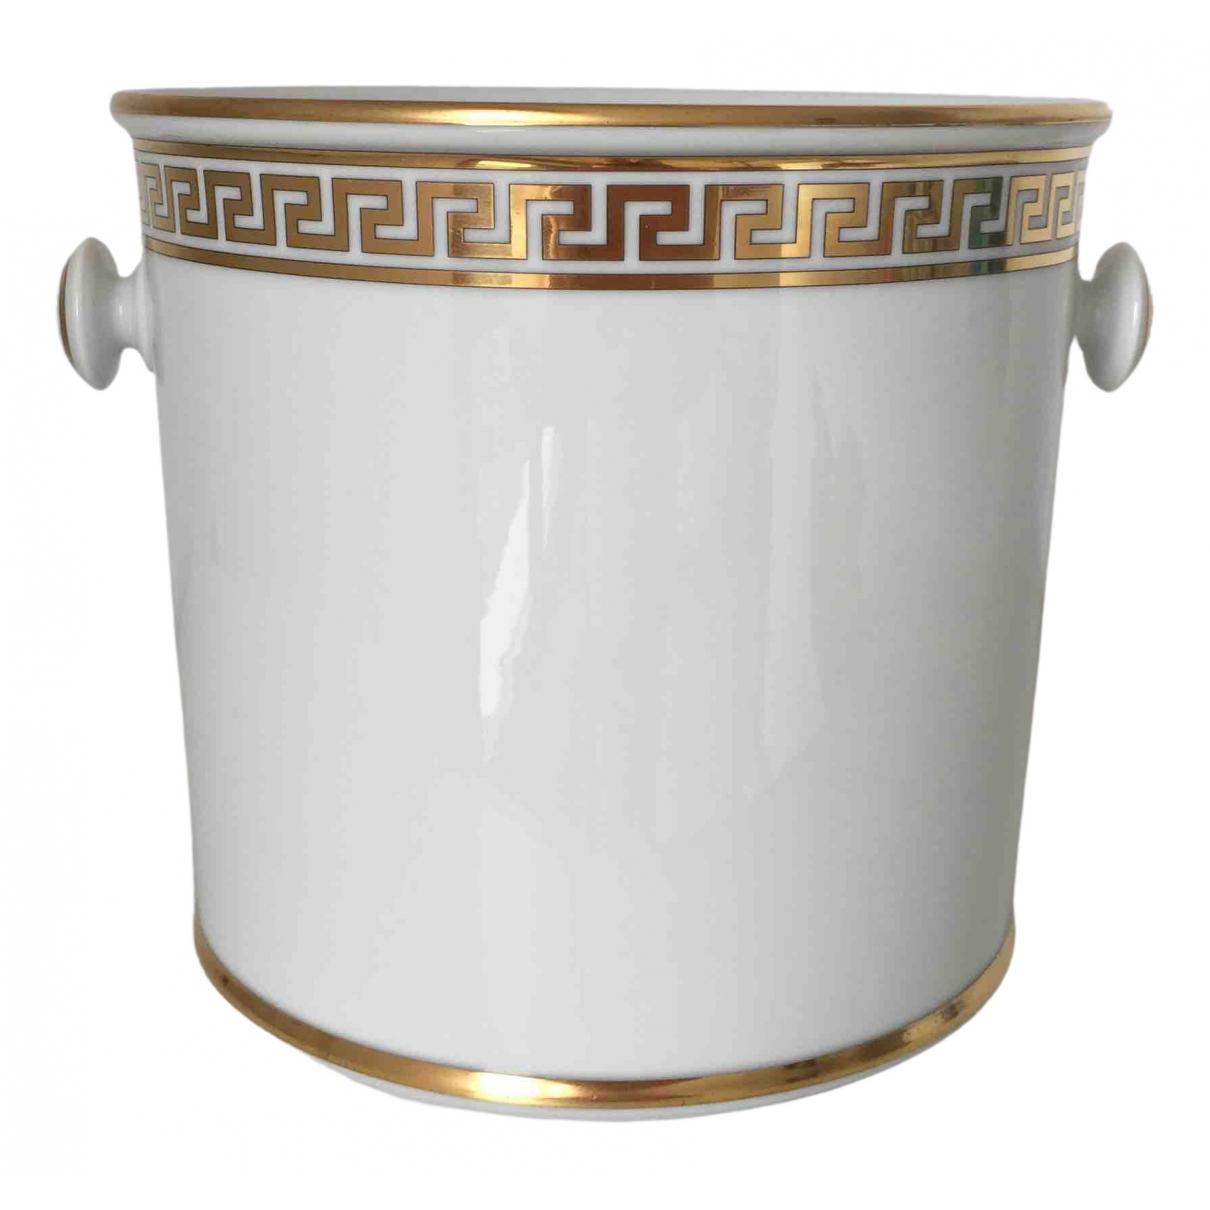 Jarron de Porcelana Versace